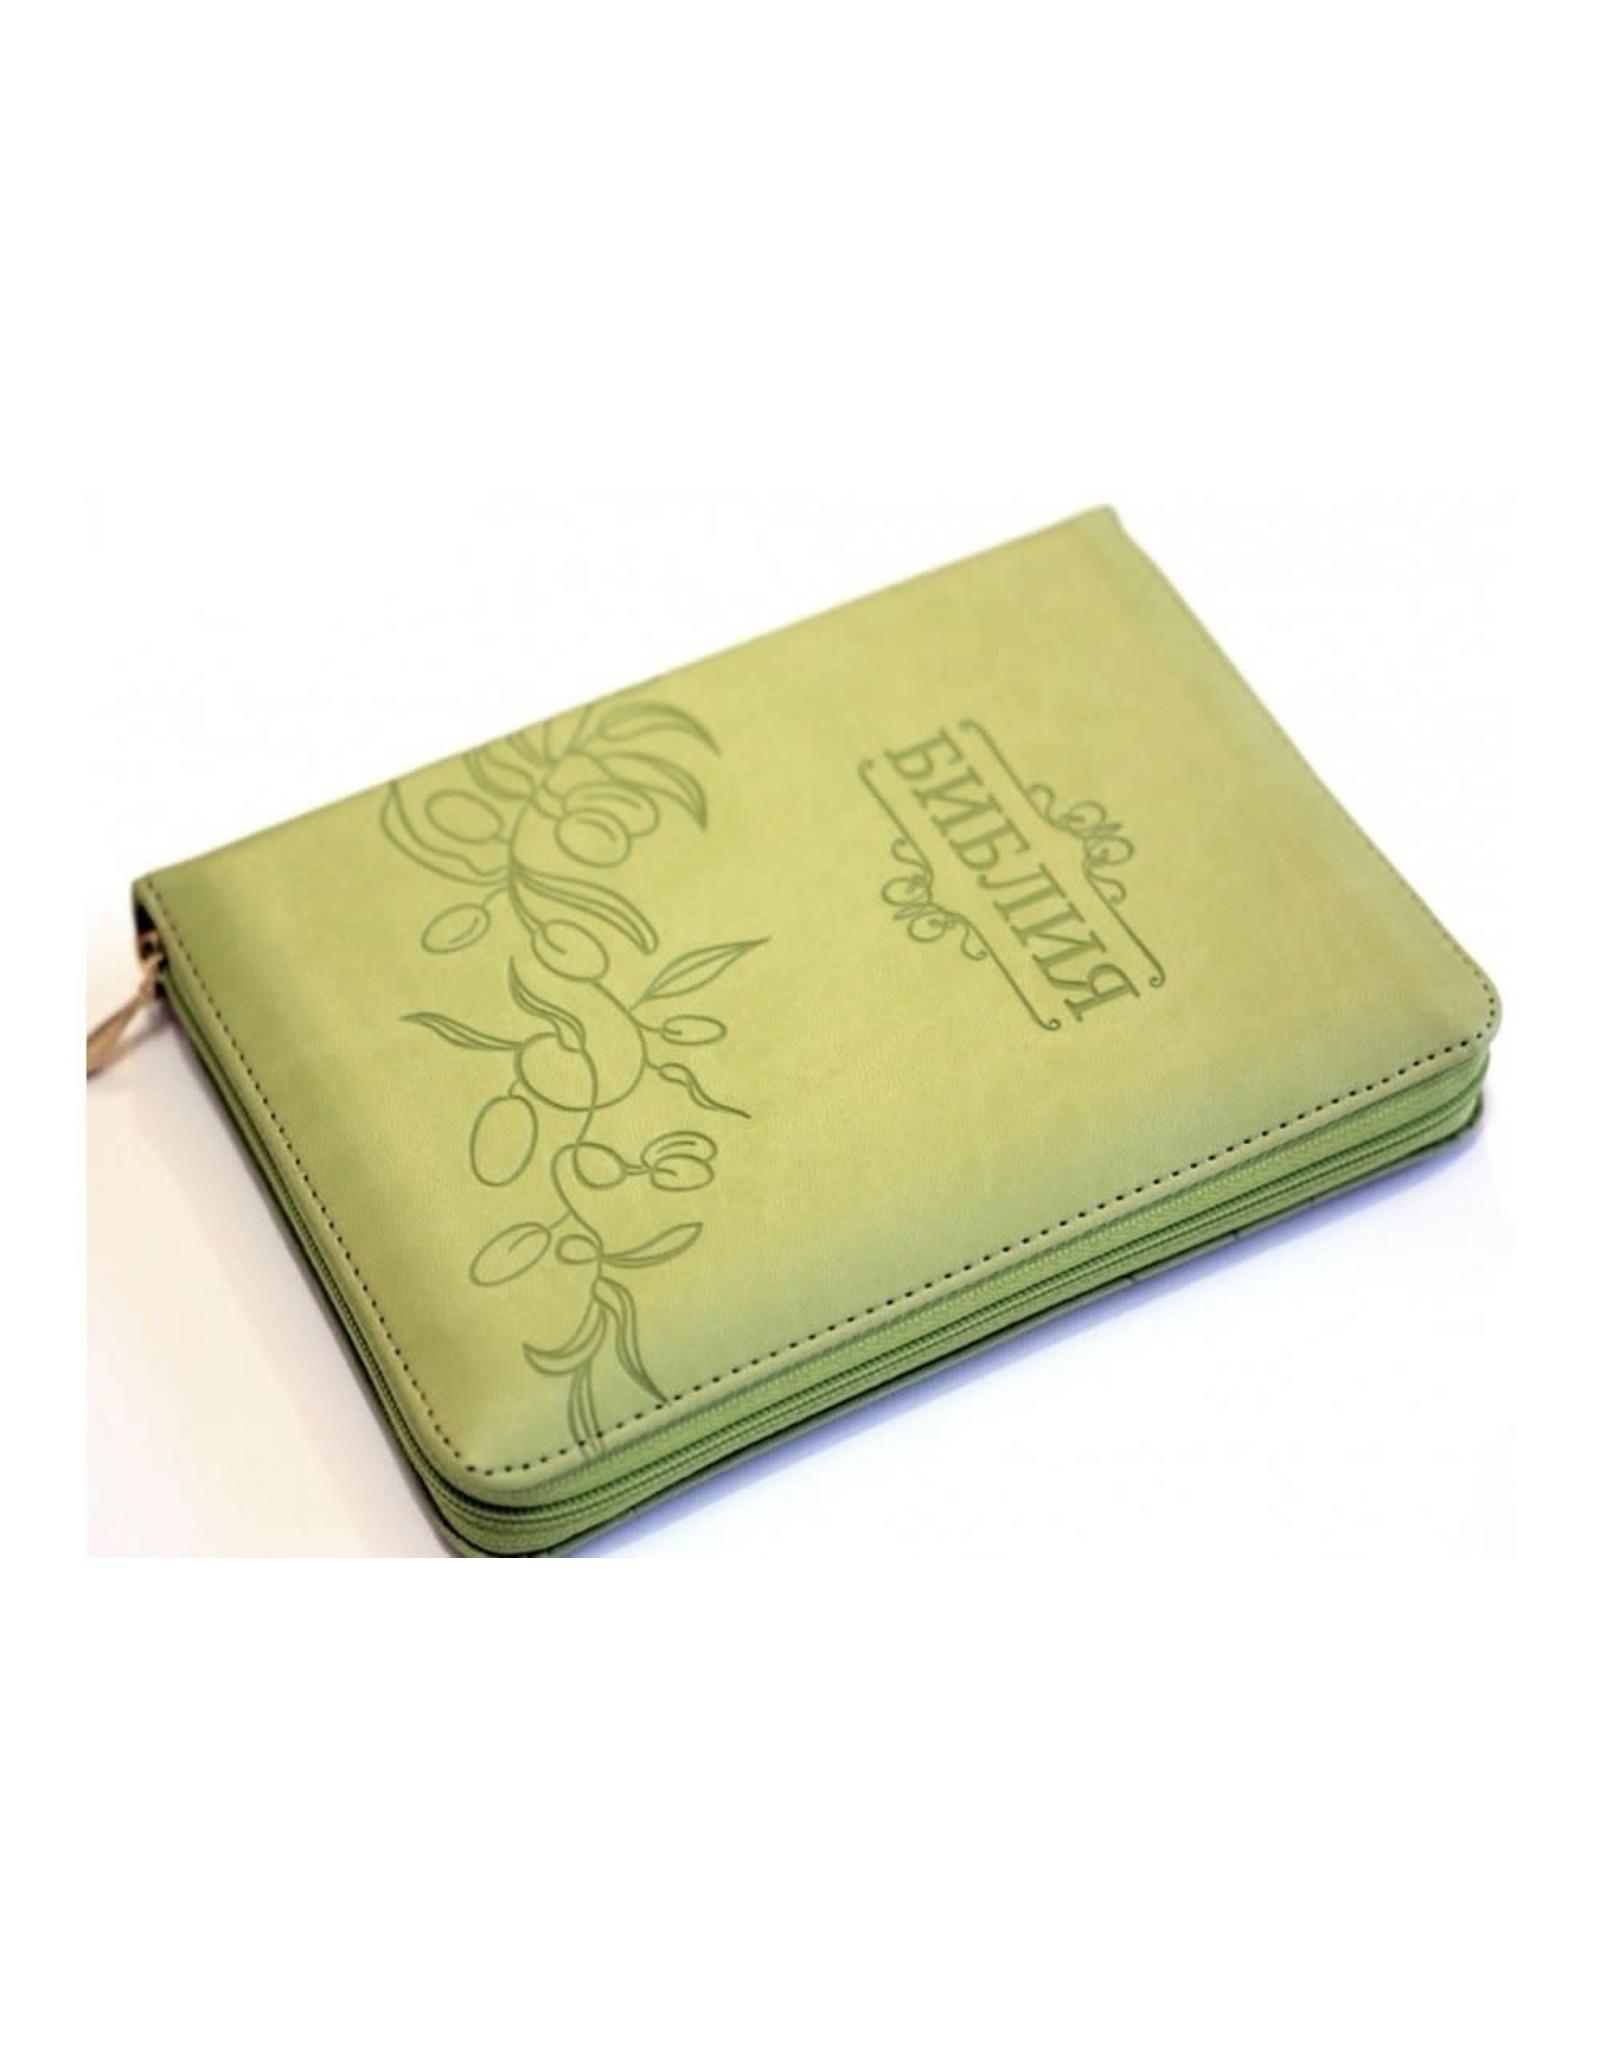 Библия, Каноническая (SYNO), Index, Leather with Zipper, Small